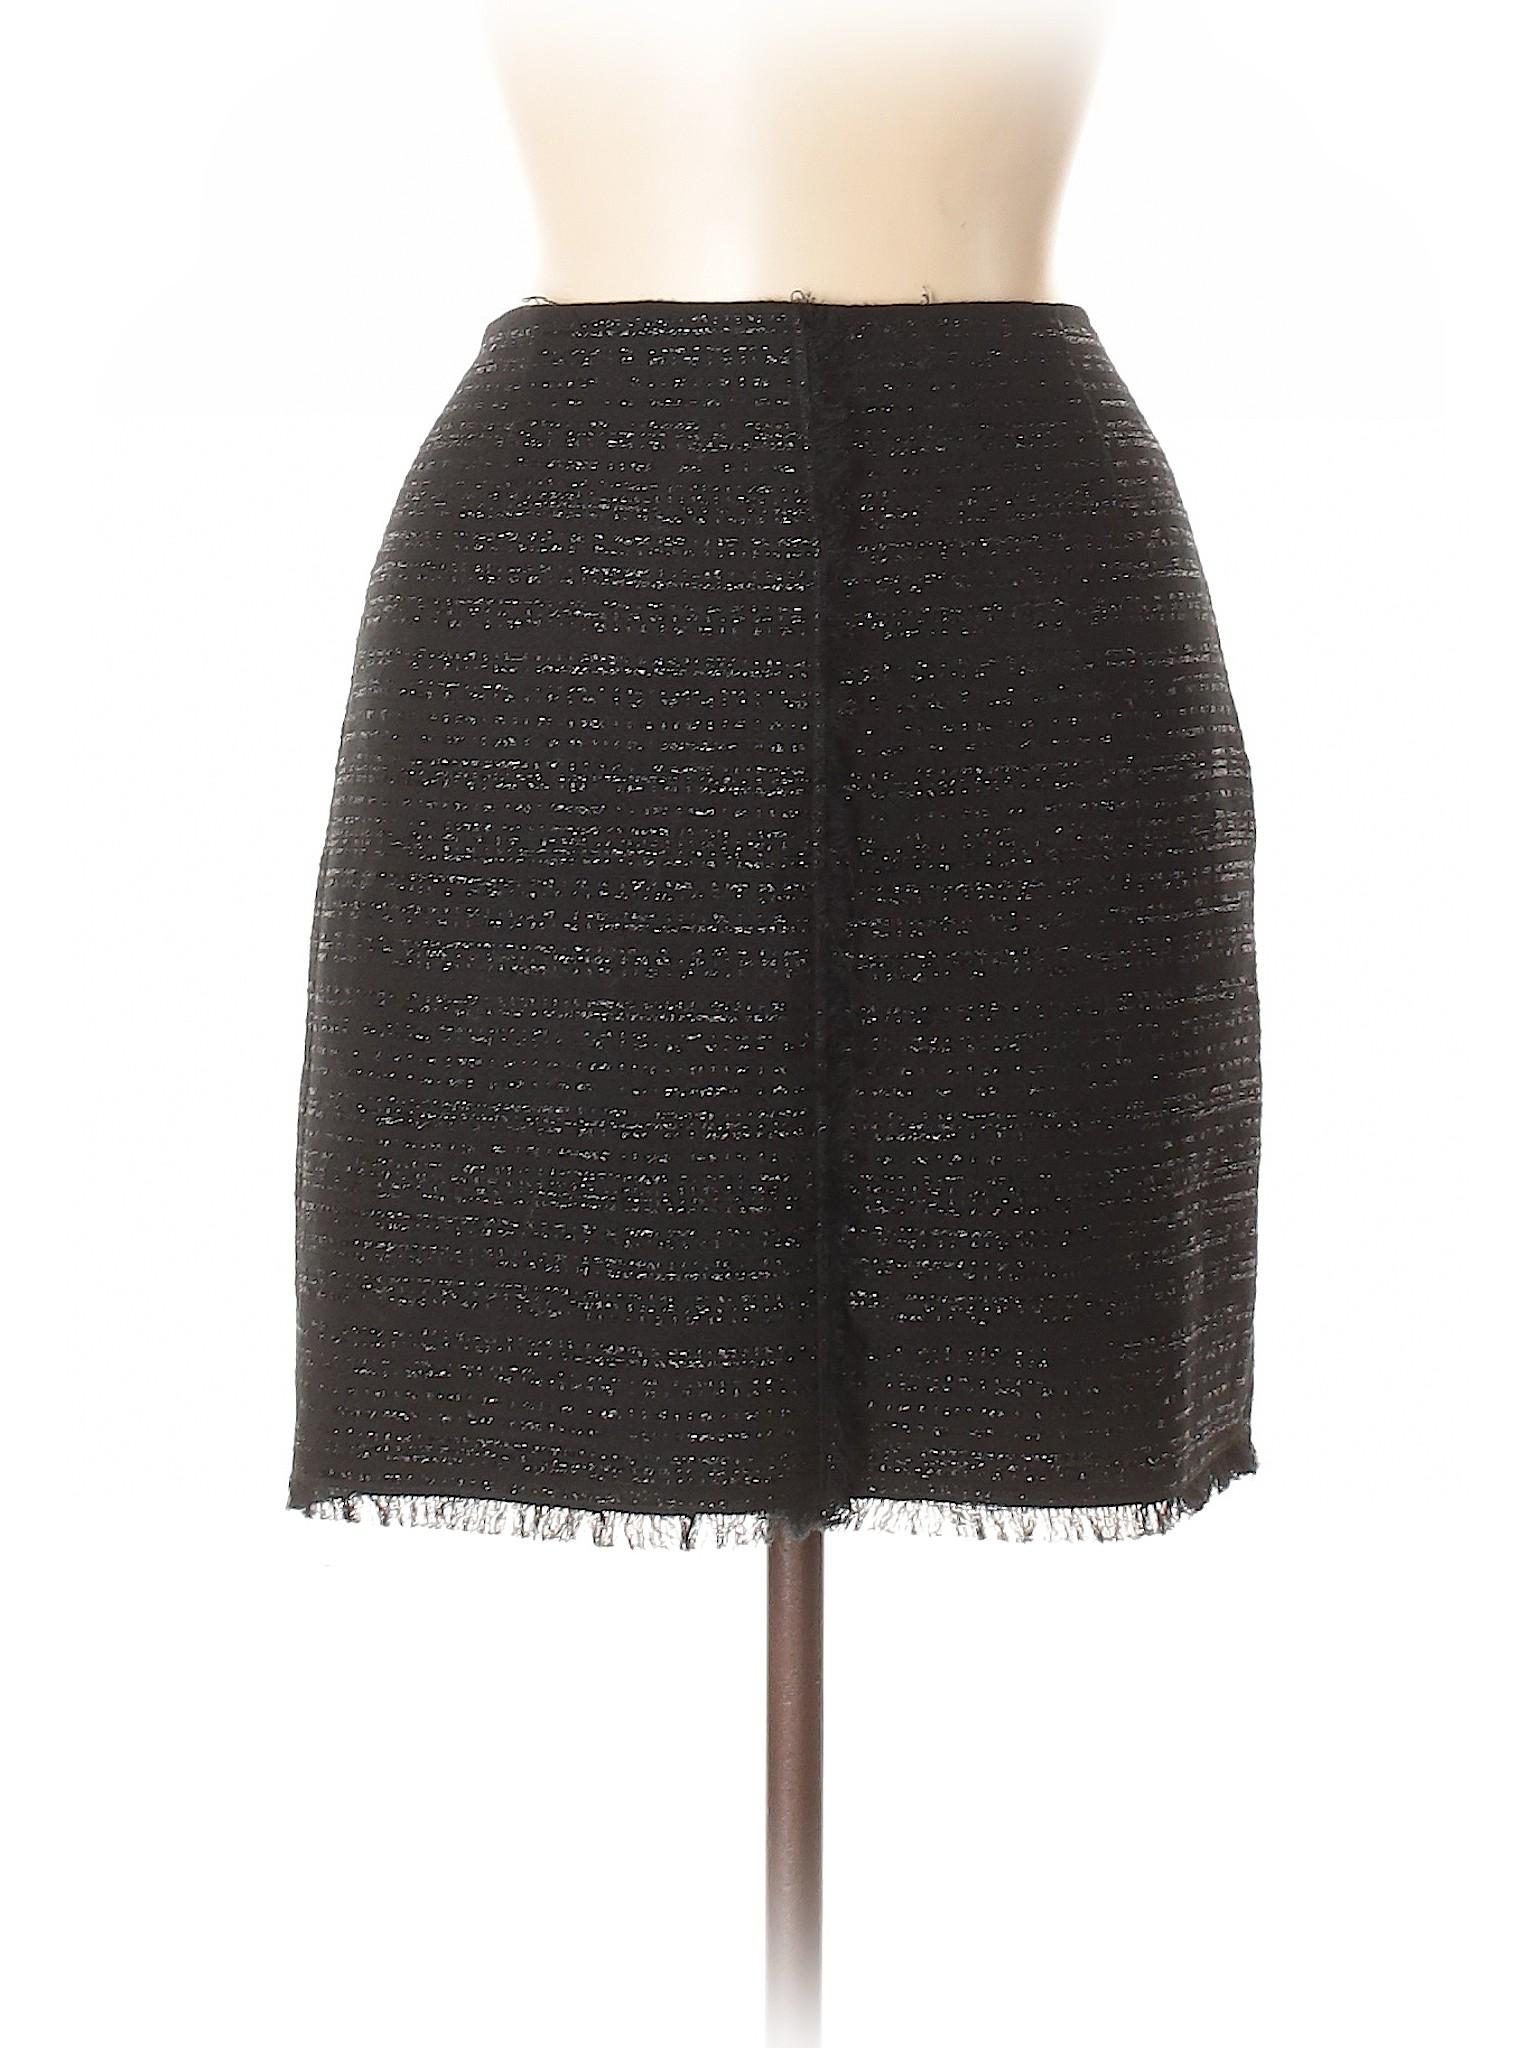 Skirt Skirt Boutique Casual Casual Casual Boutique Casual Boutique Boutique Skirt UgngxvqwOH